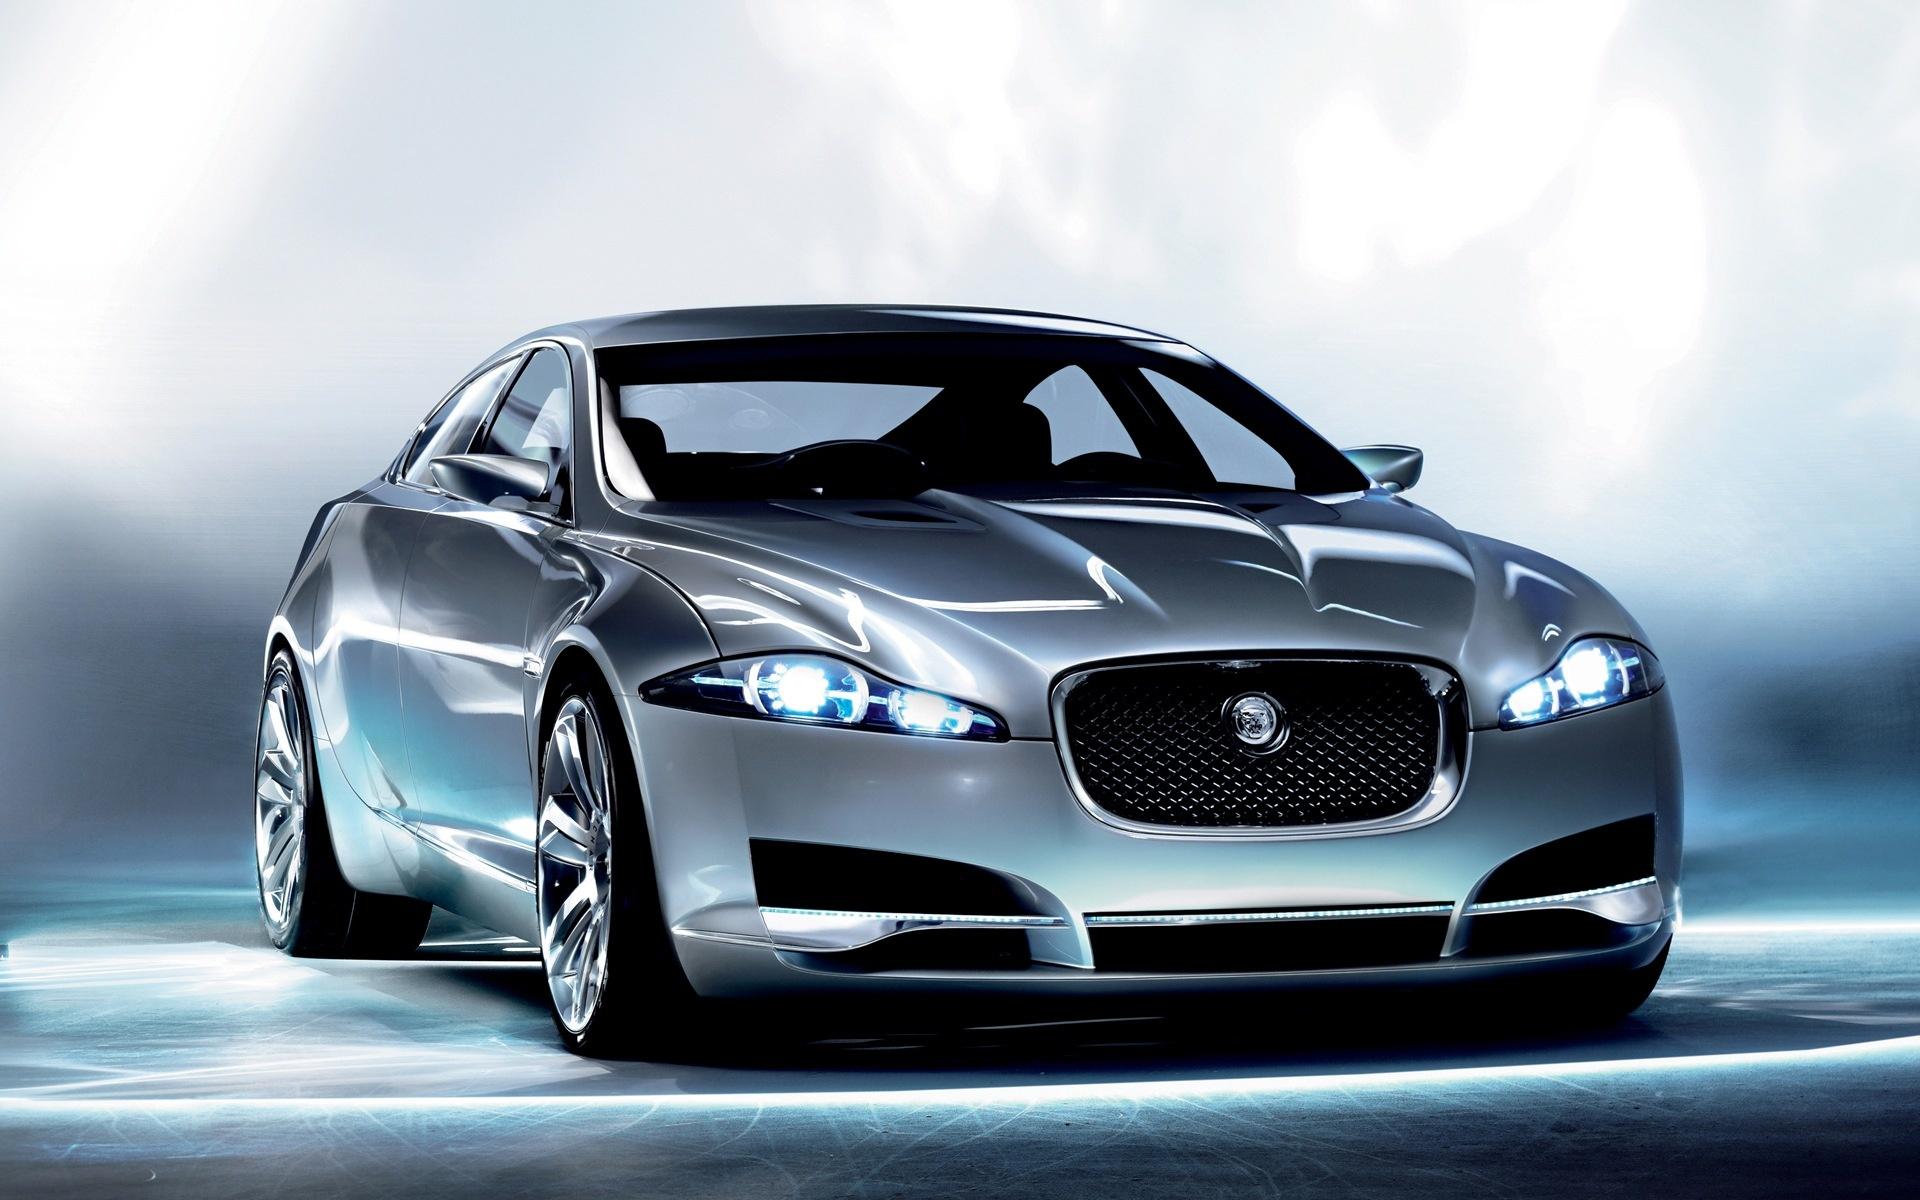 Jaguar C Xf Concept 3 Wallpapers In Jpg Format For Free Download